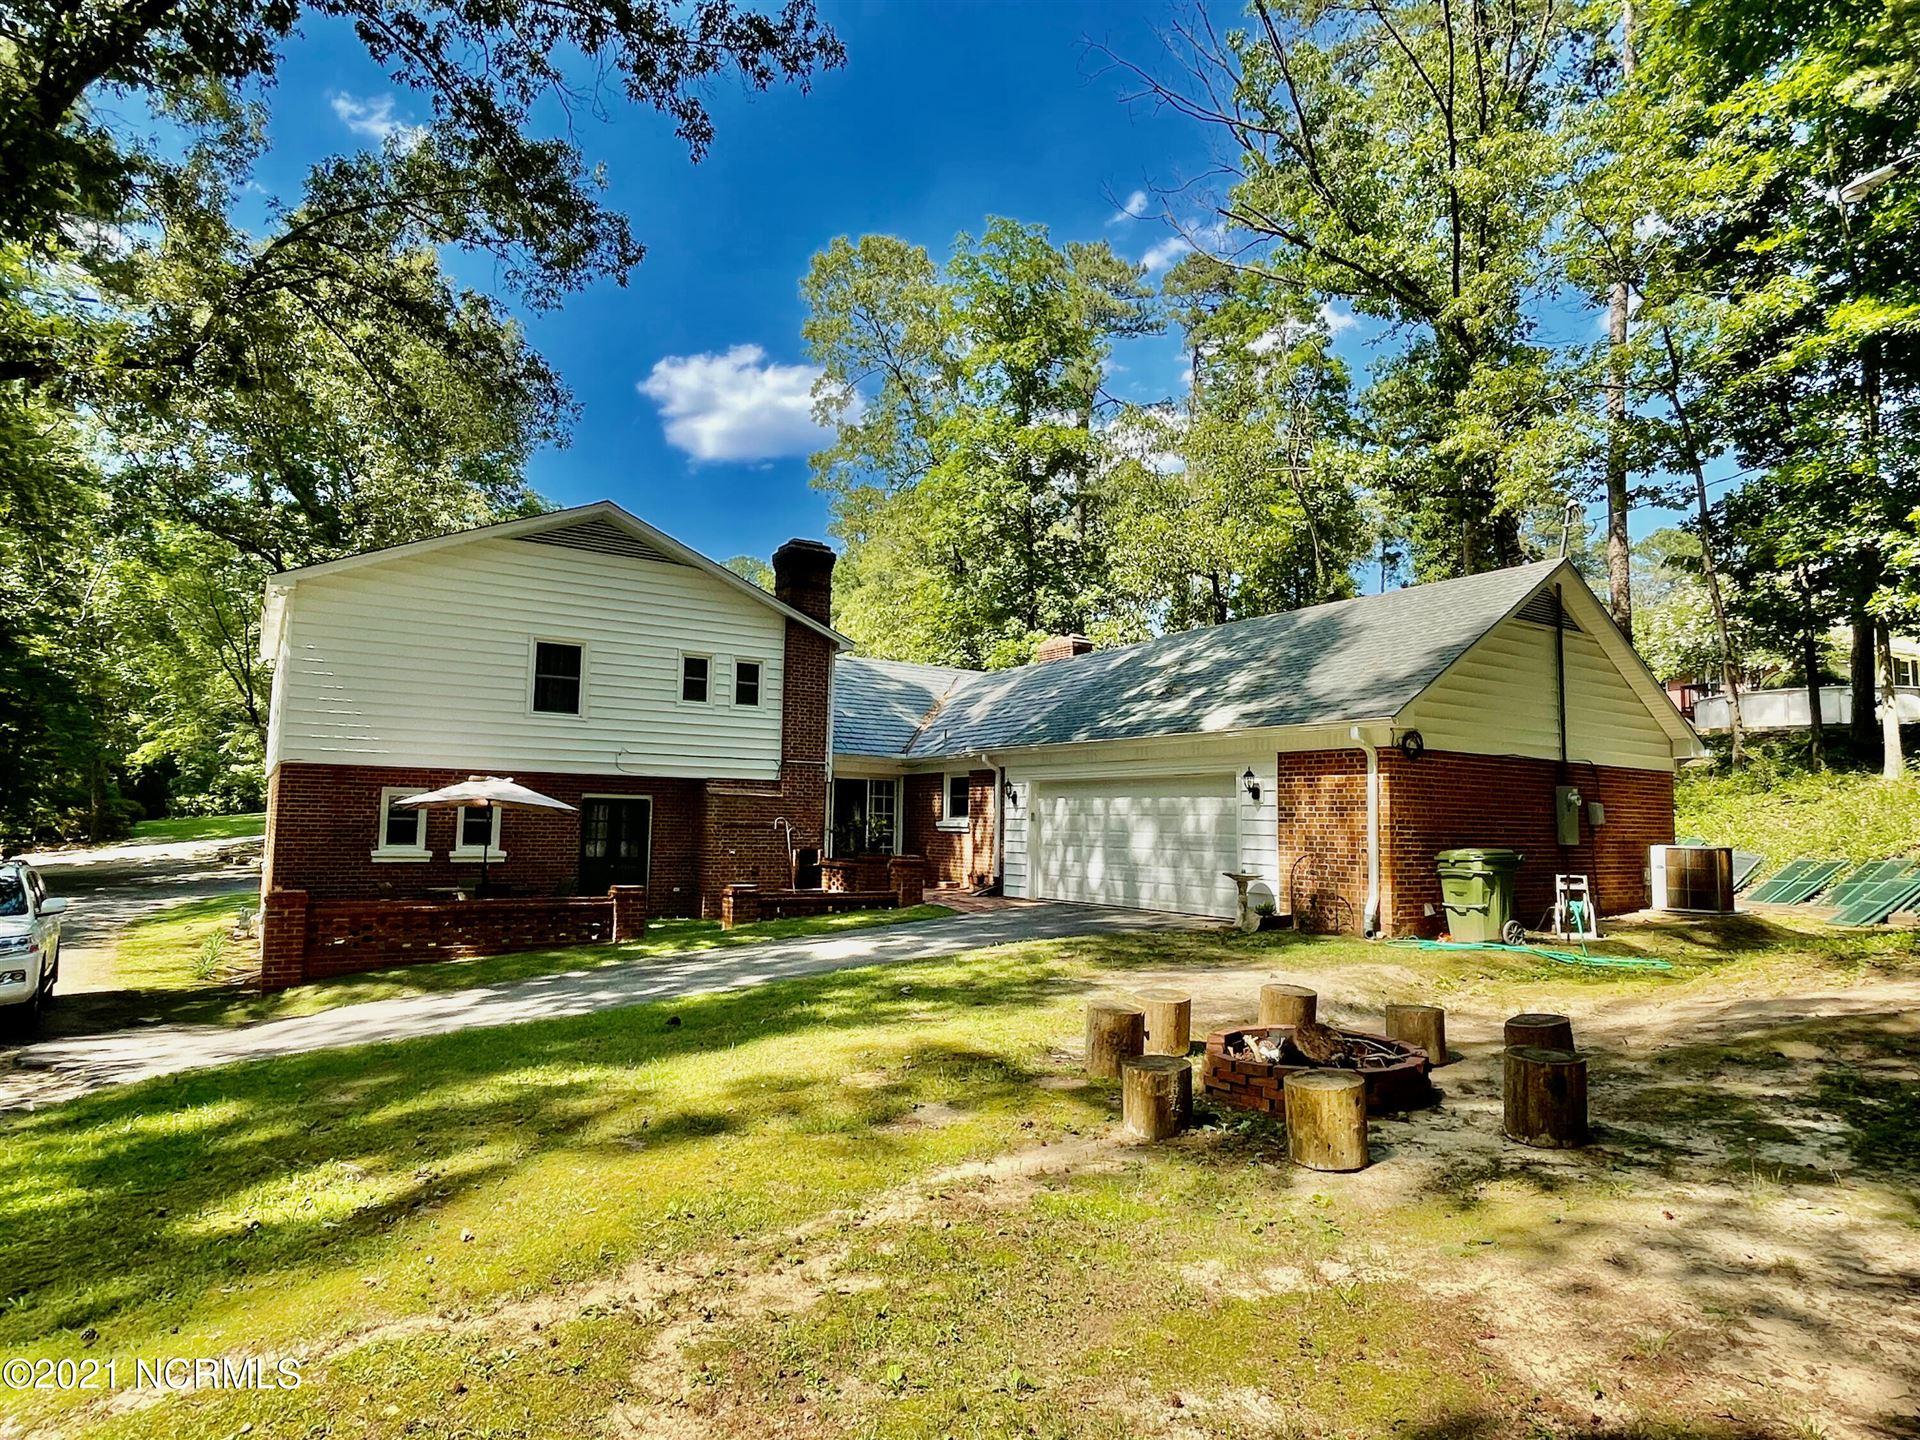 Photo of 1010 Rowan Terrace, Rockingham, NC 28379 (MLS # 100296671)